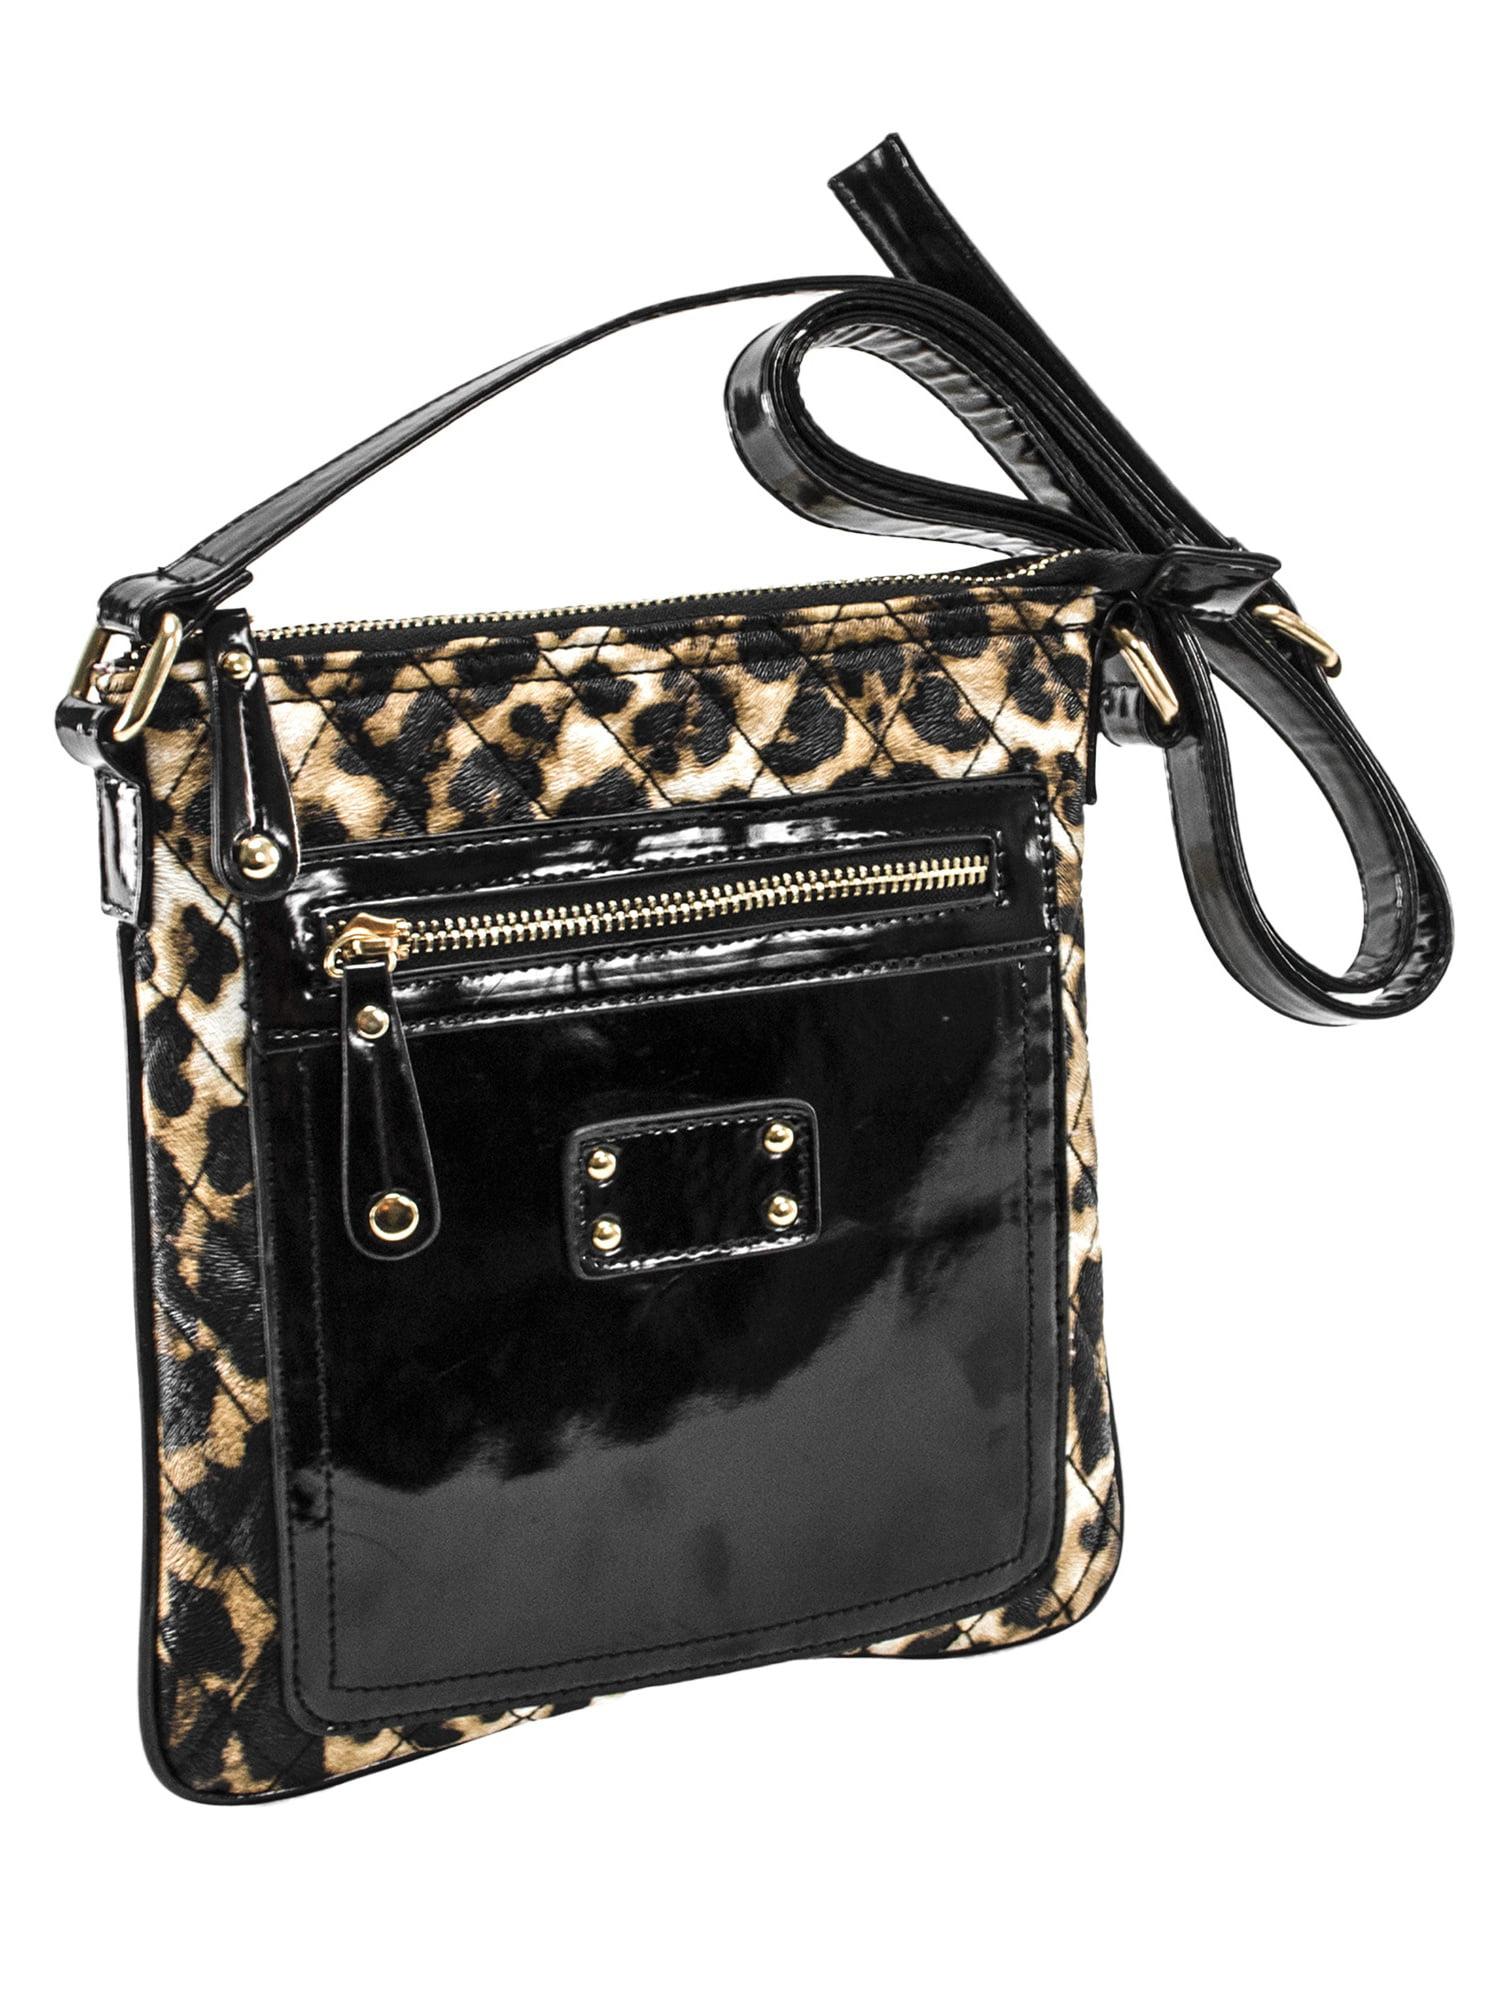 New Quilted Faux Leather Metallic Lion Decoration Ladies Shoulder Bag